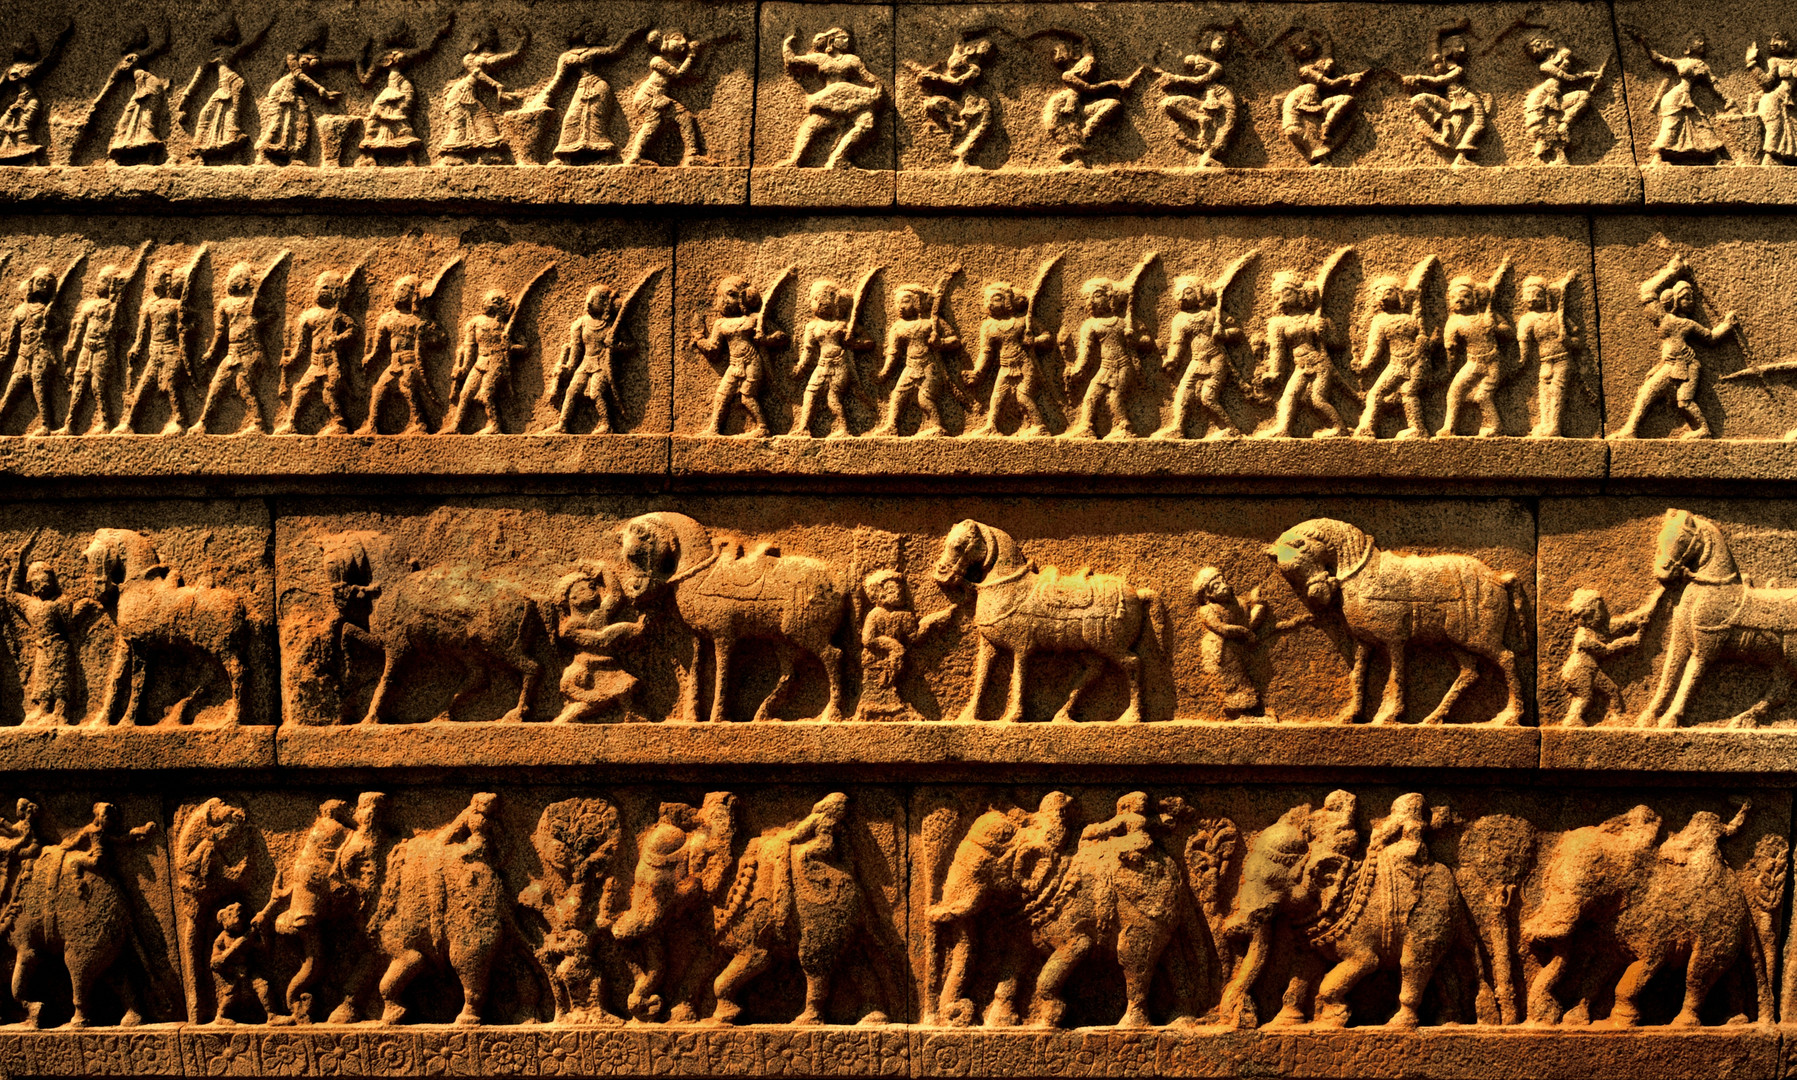 Fries mit Tänzerinnen Pferden u Elefanten